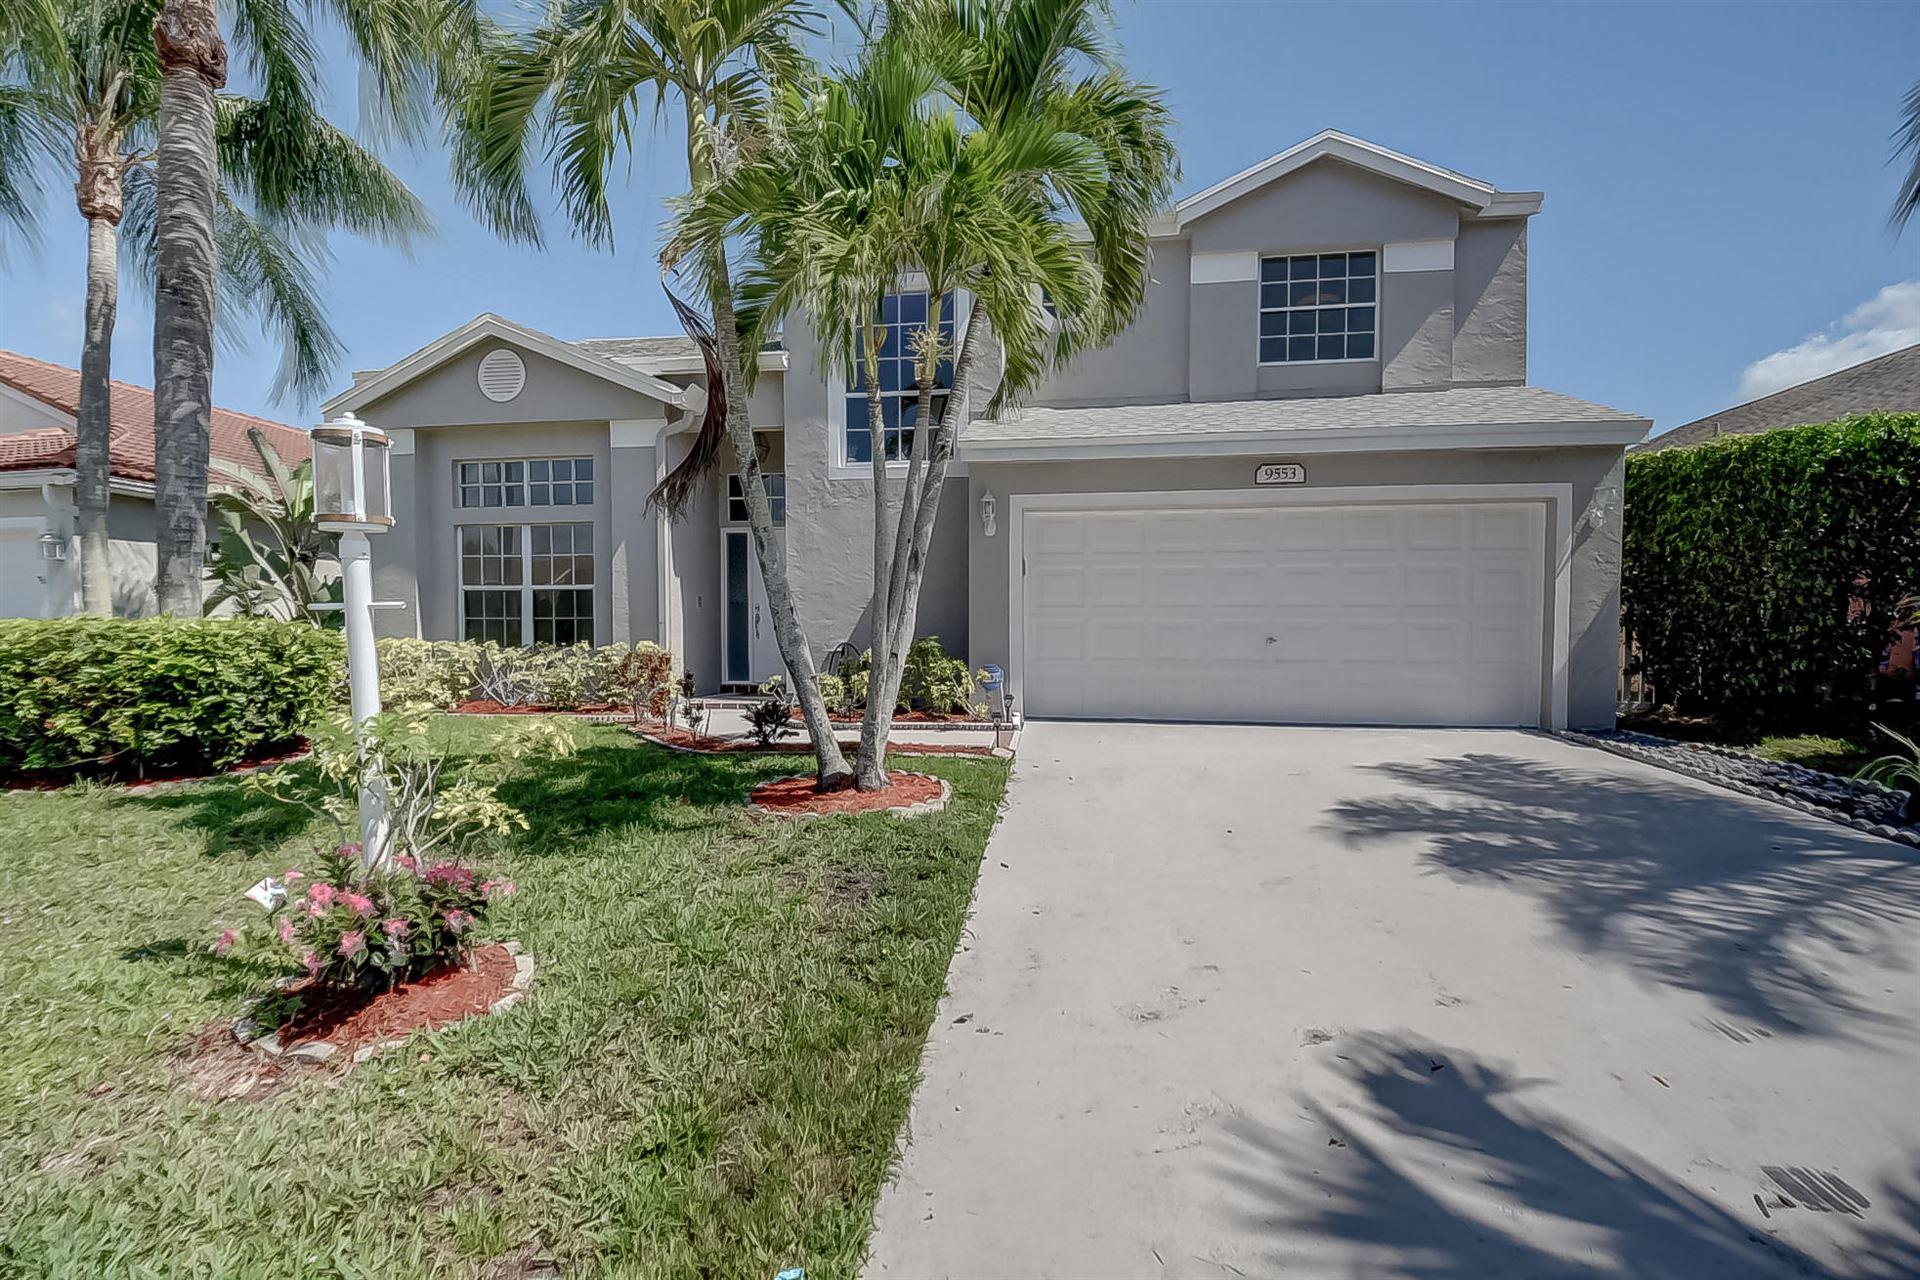 9553 Tavernier Drive, Boca Raton, FL 33496 - MLS#: RX-10713526